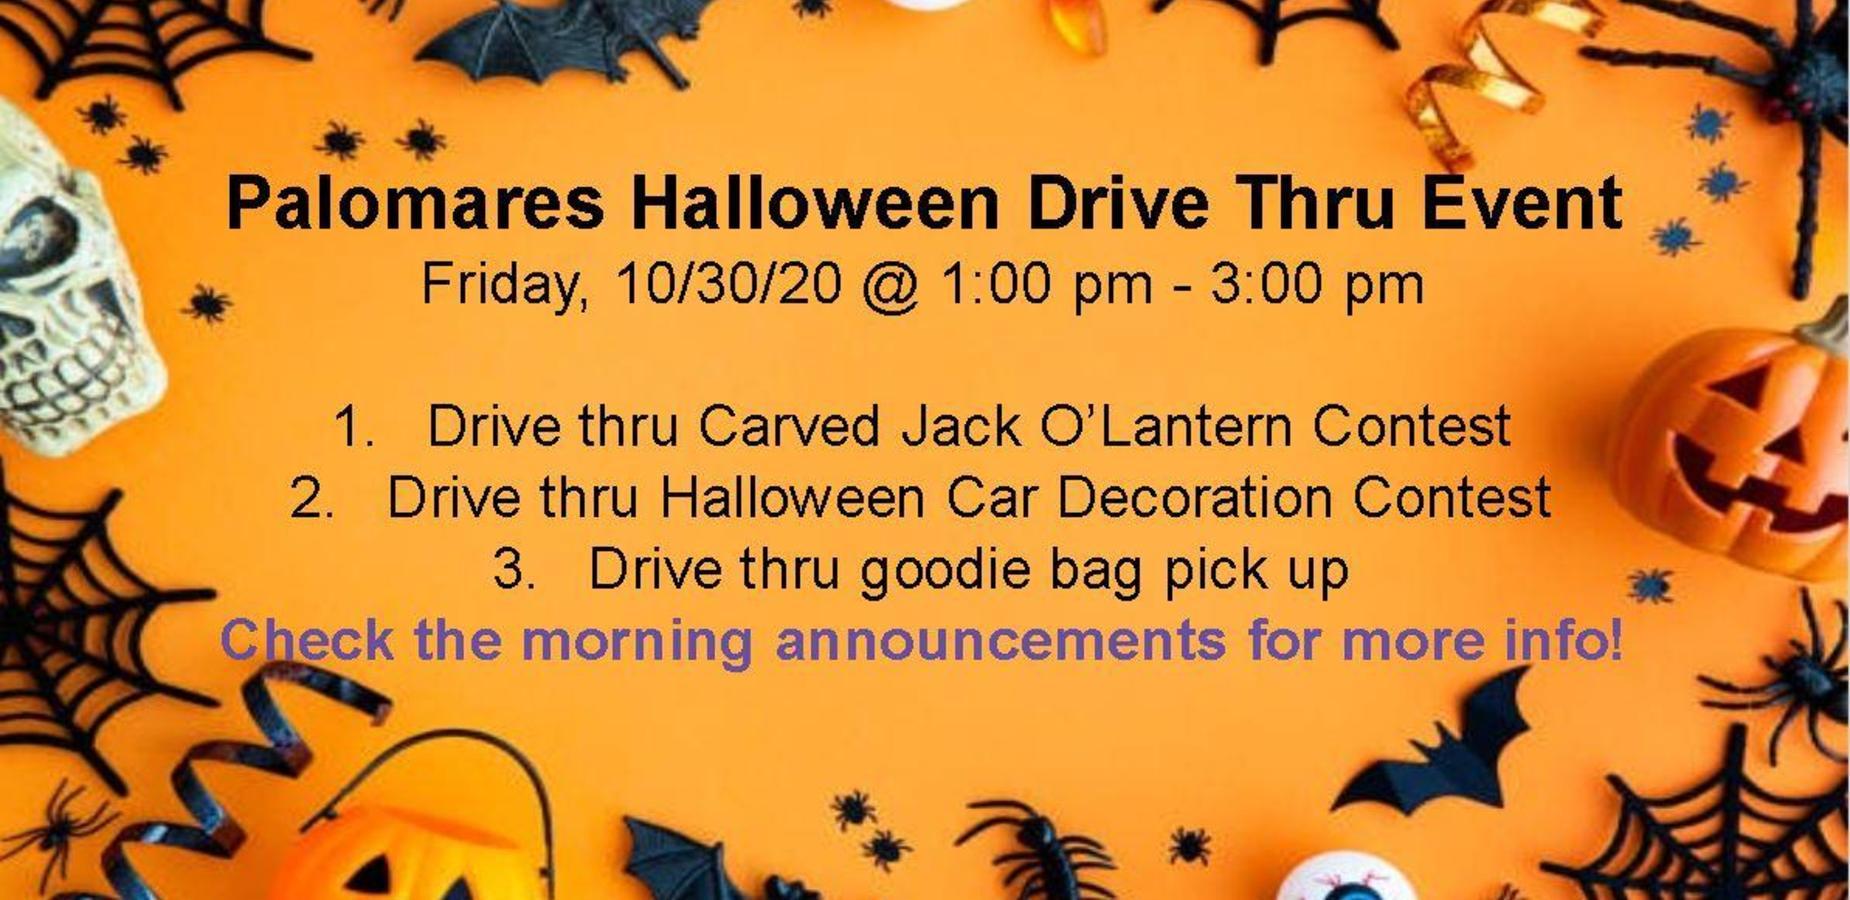 Palomares Halloween Drive Thru